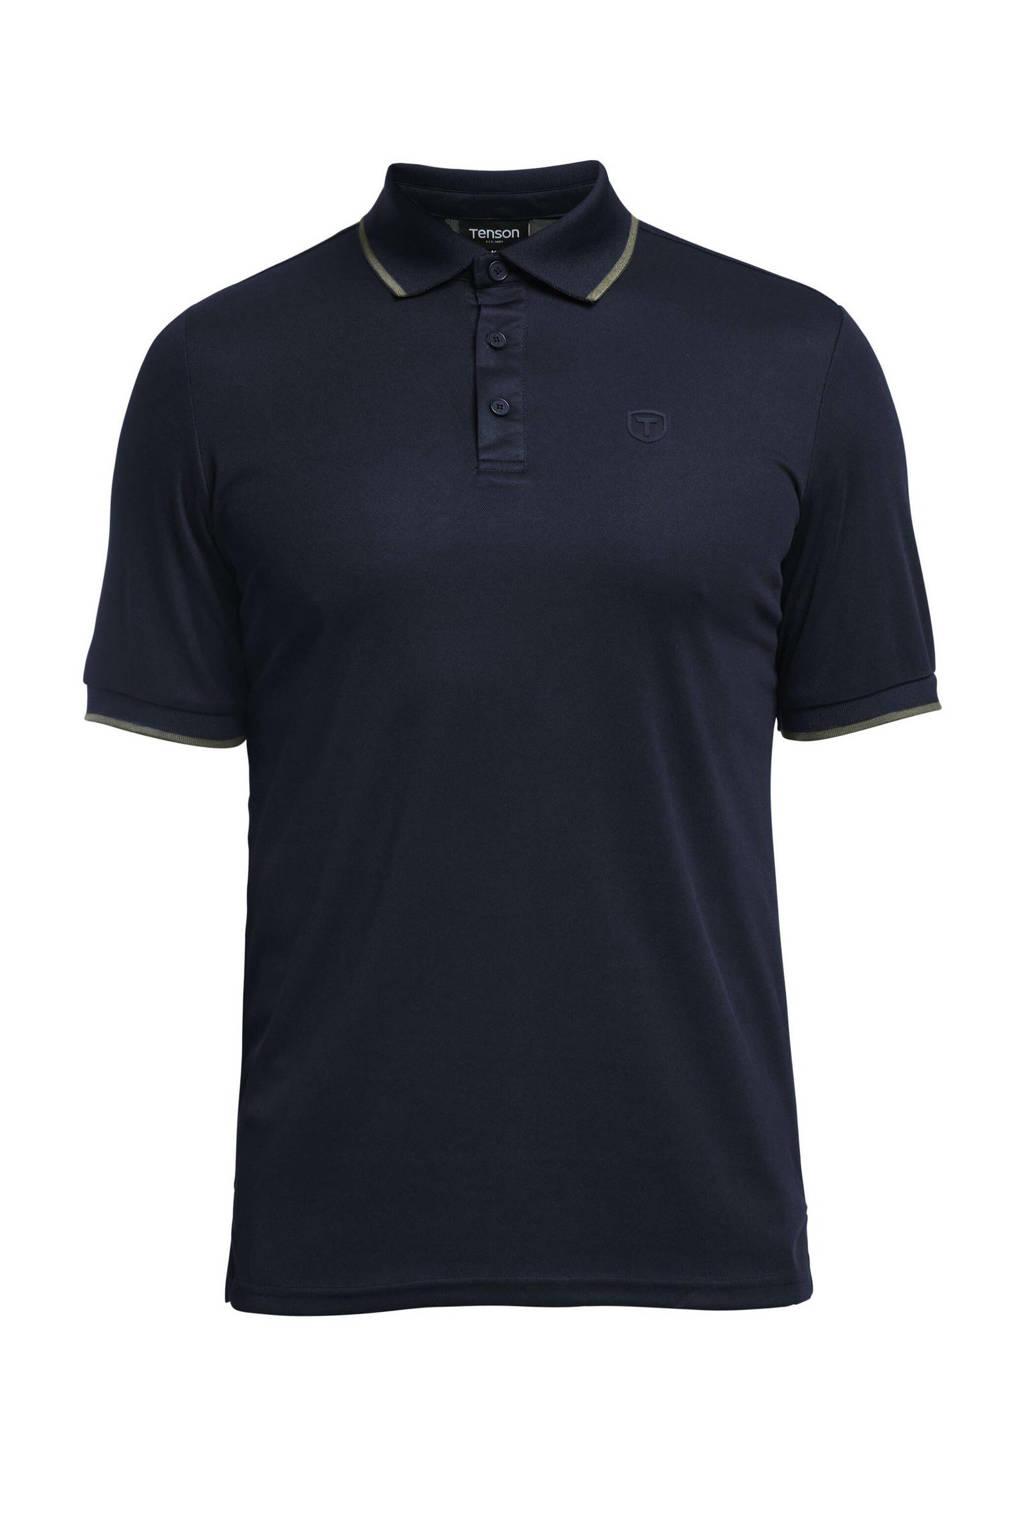 Tenson outdoor polo Wedge donkerblauw, Donkerblauw